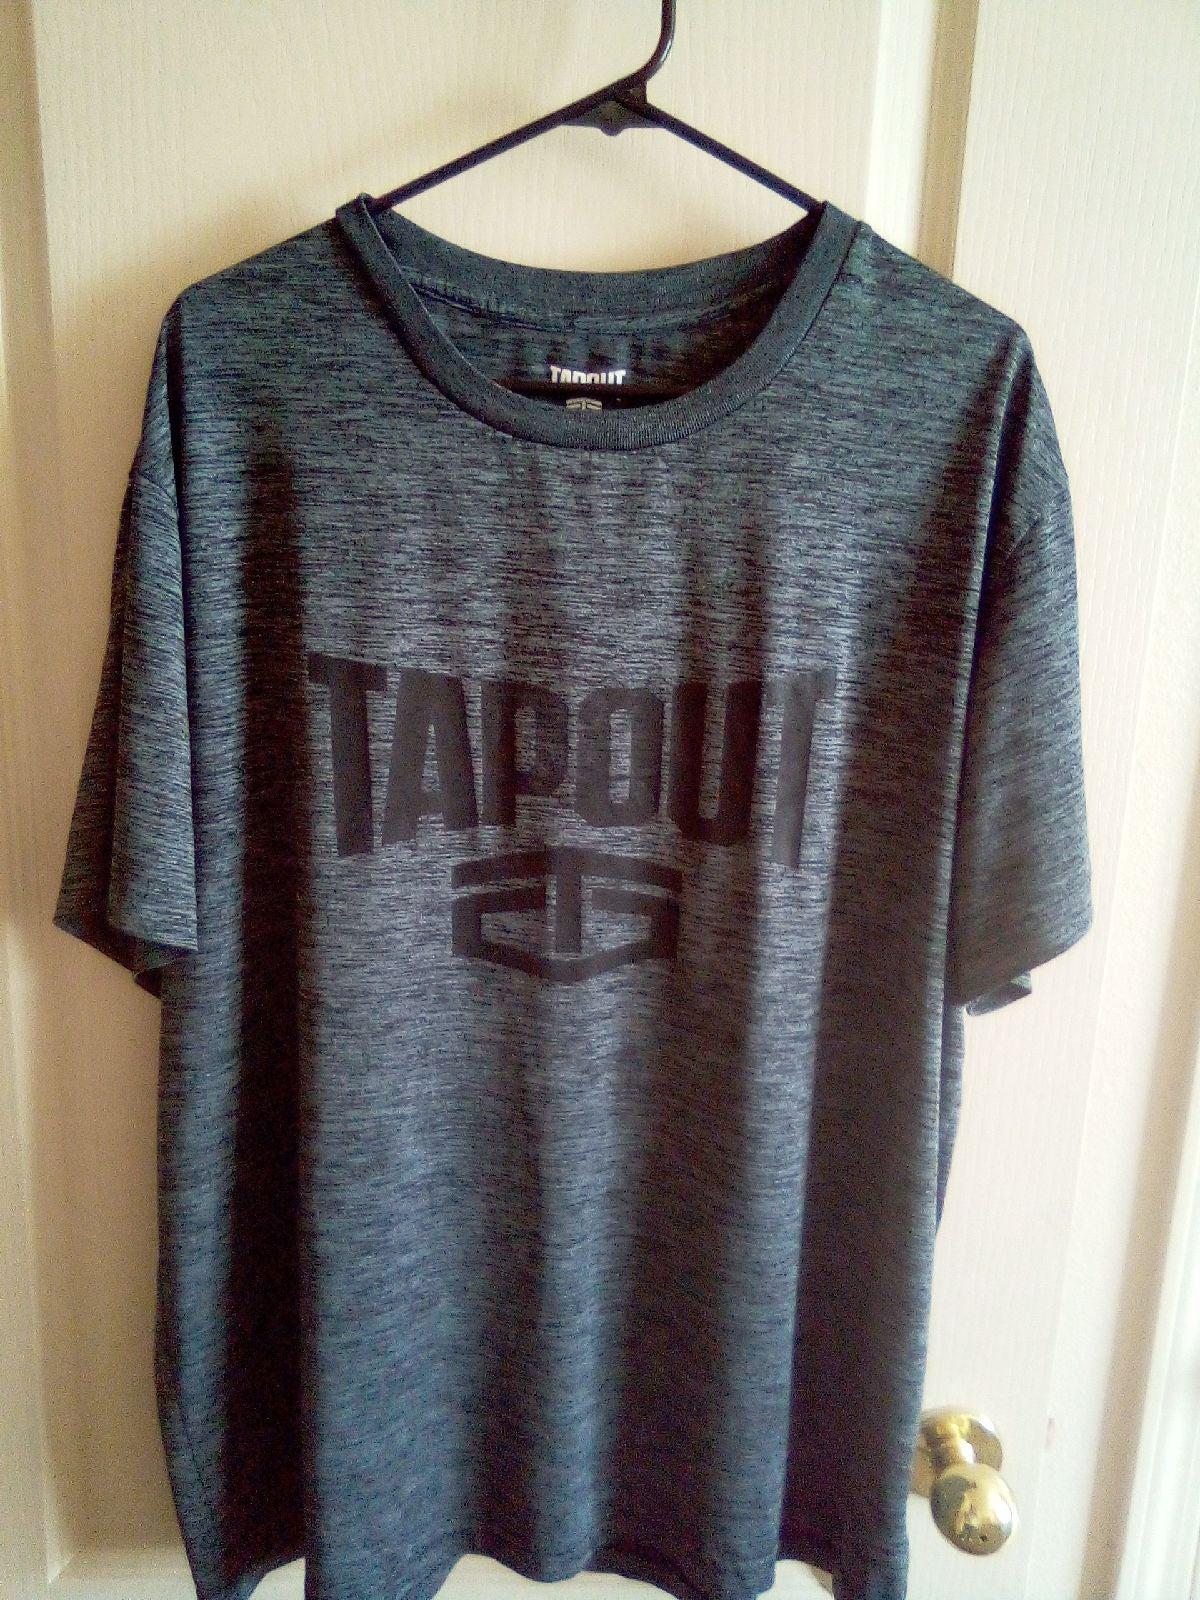 Mens 2xl T shirt